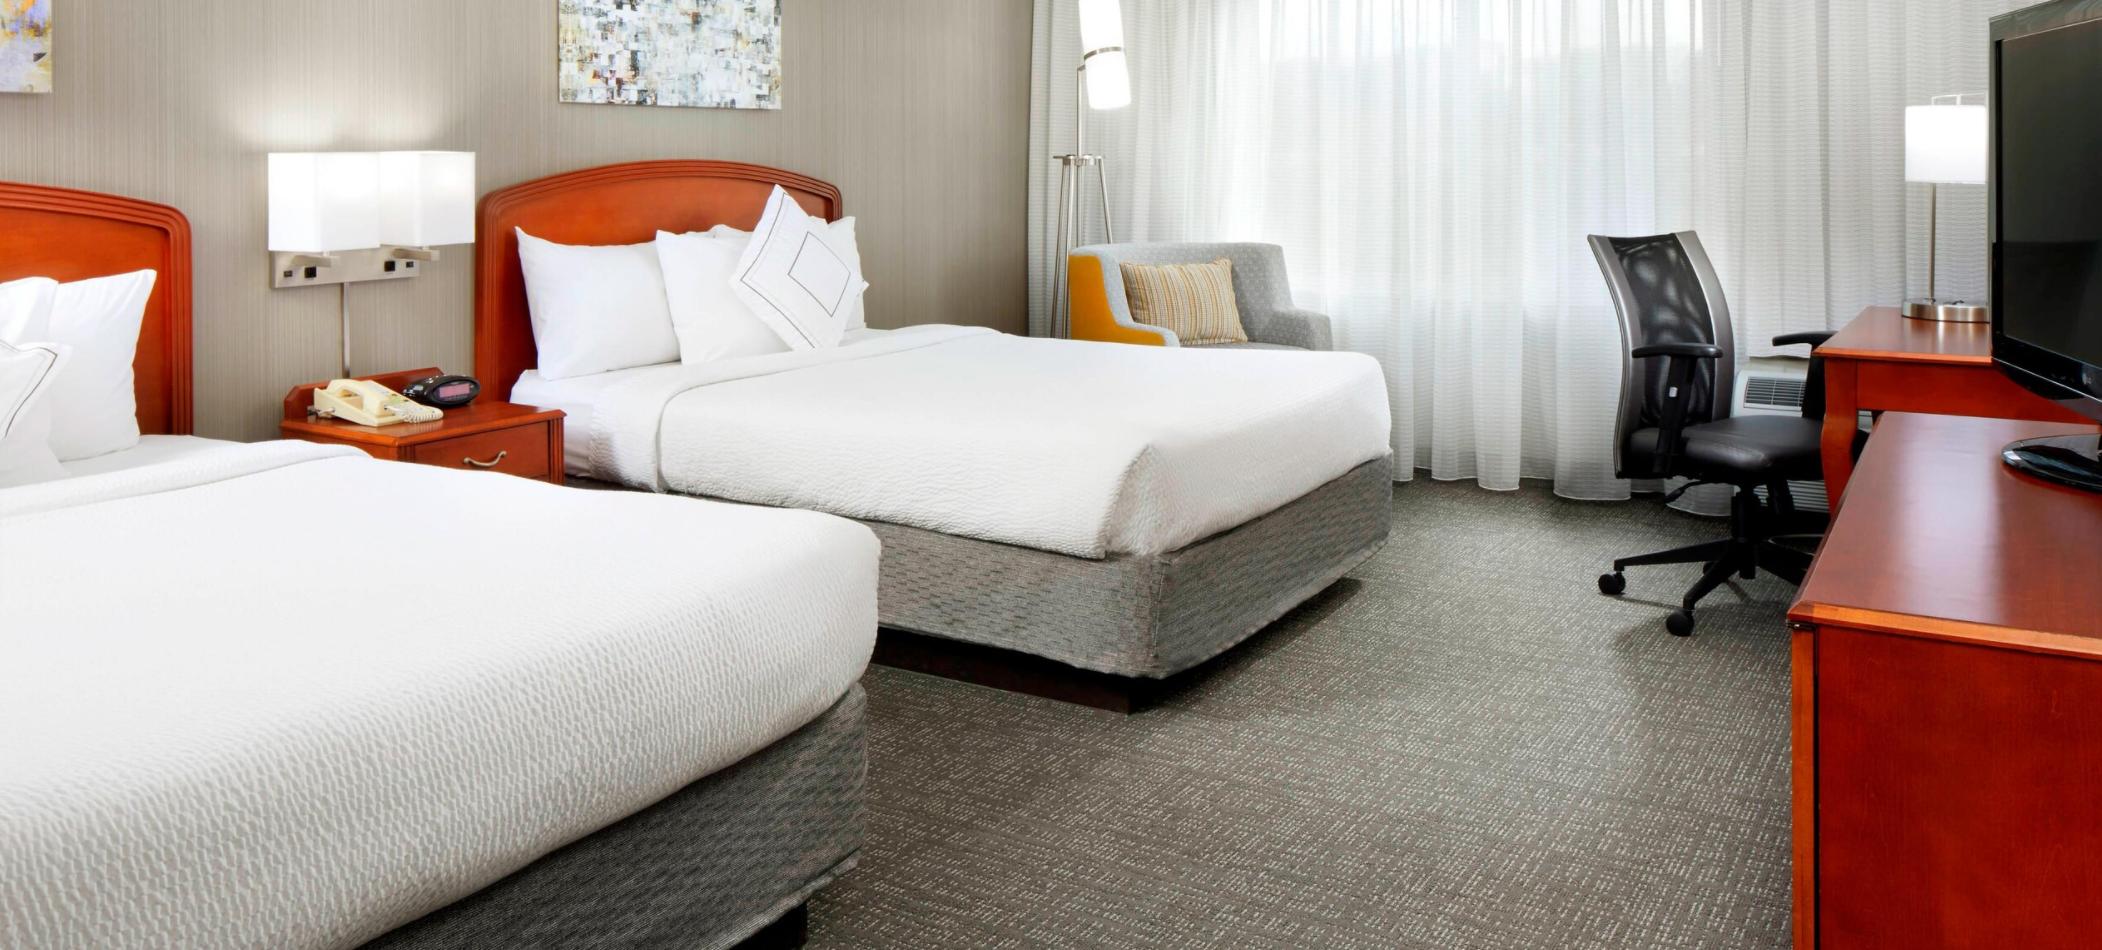 https://www.hotelsbyday.com/_data/default-hotel_image/3/17905/screenshot-2020-06-10-at-3-37-05-pm.png